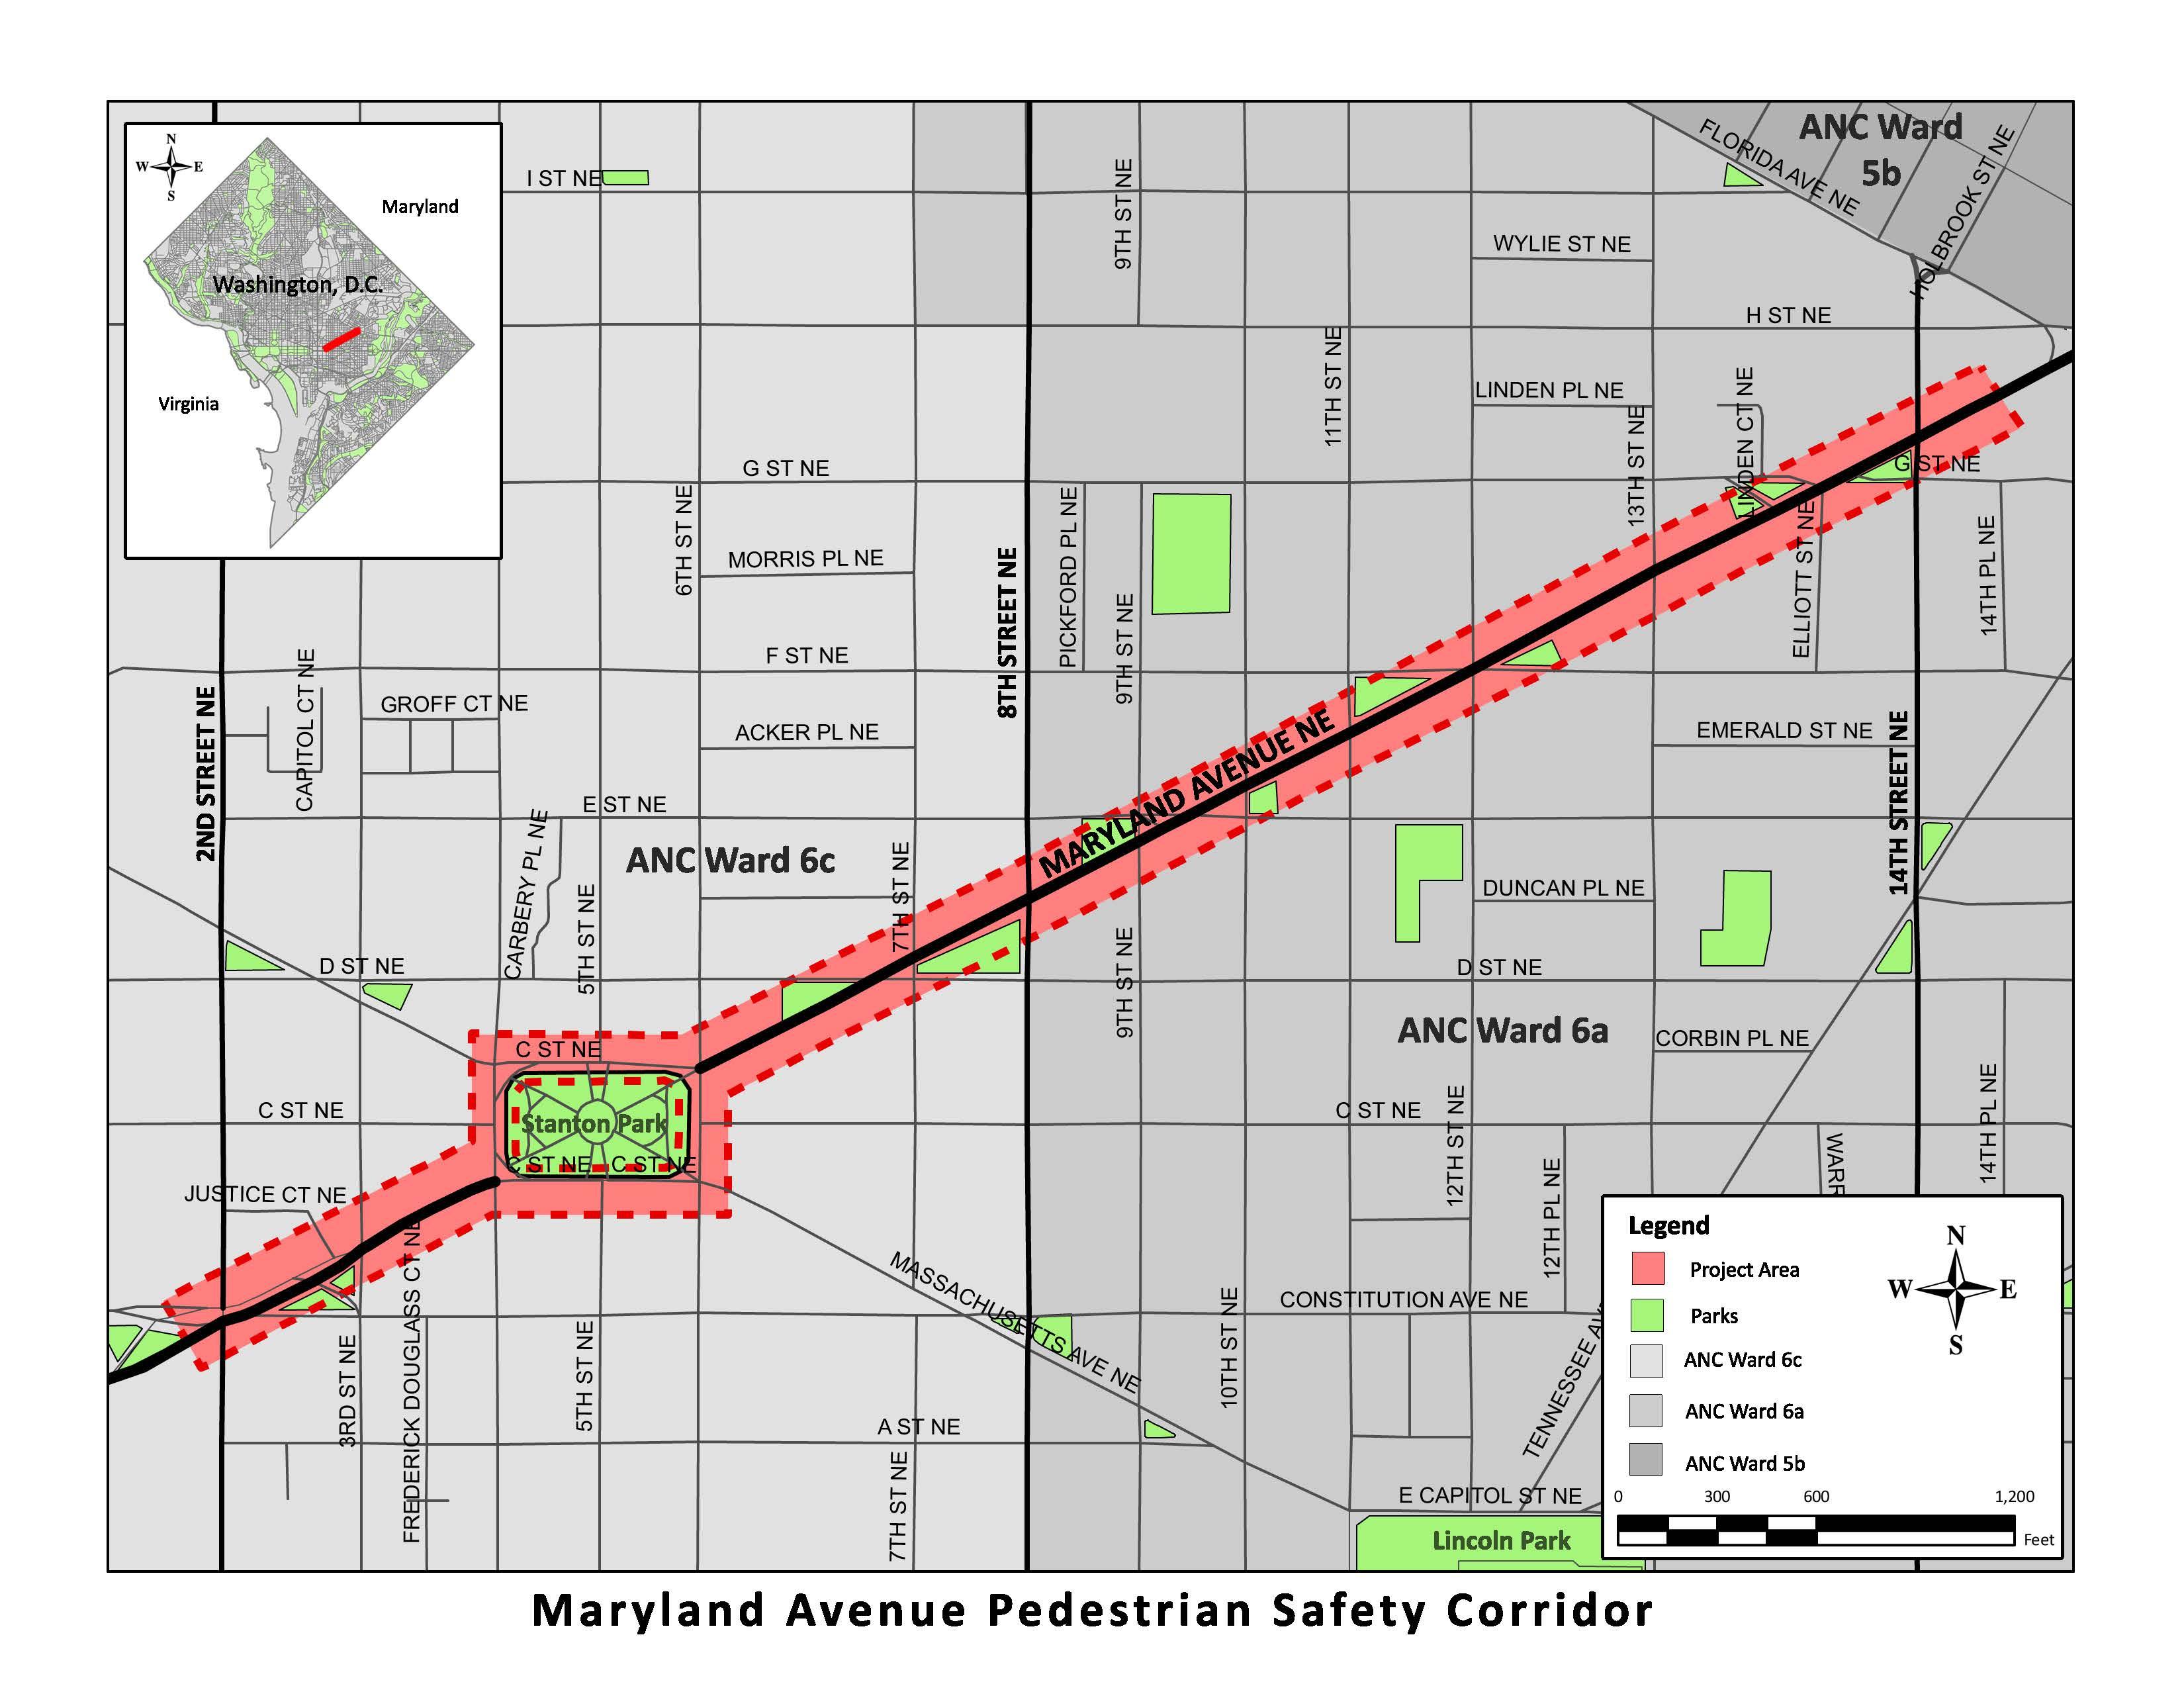 MD_Avenue_Web_Map.jpg